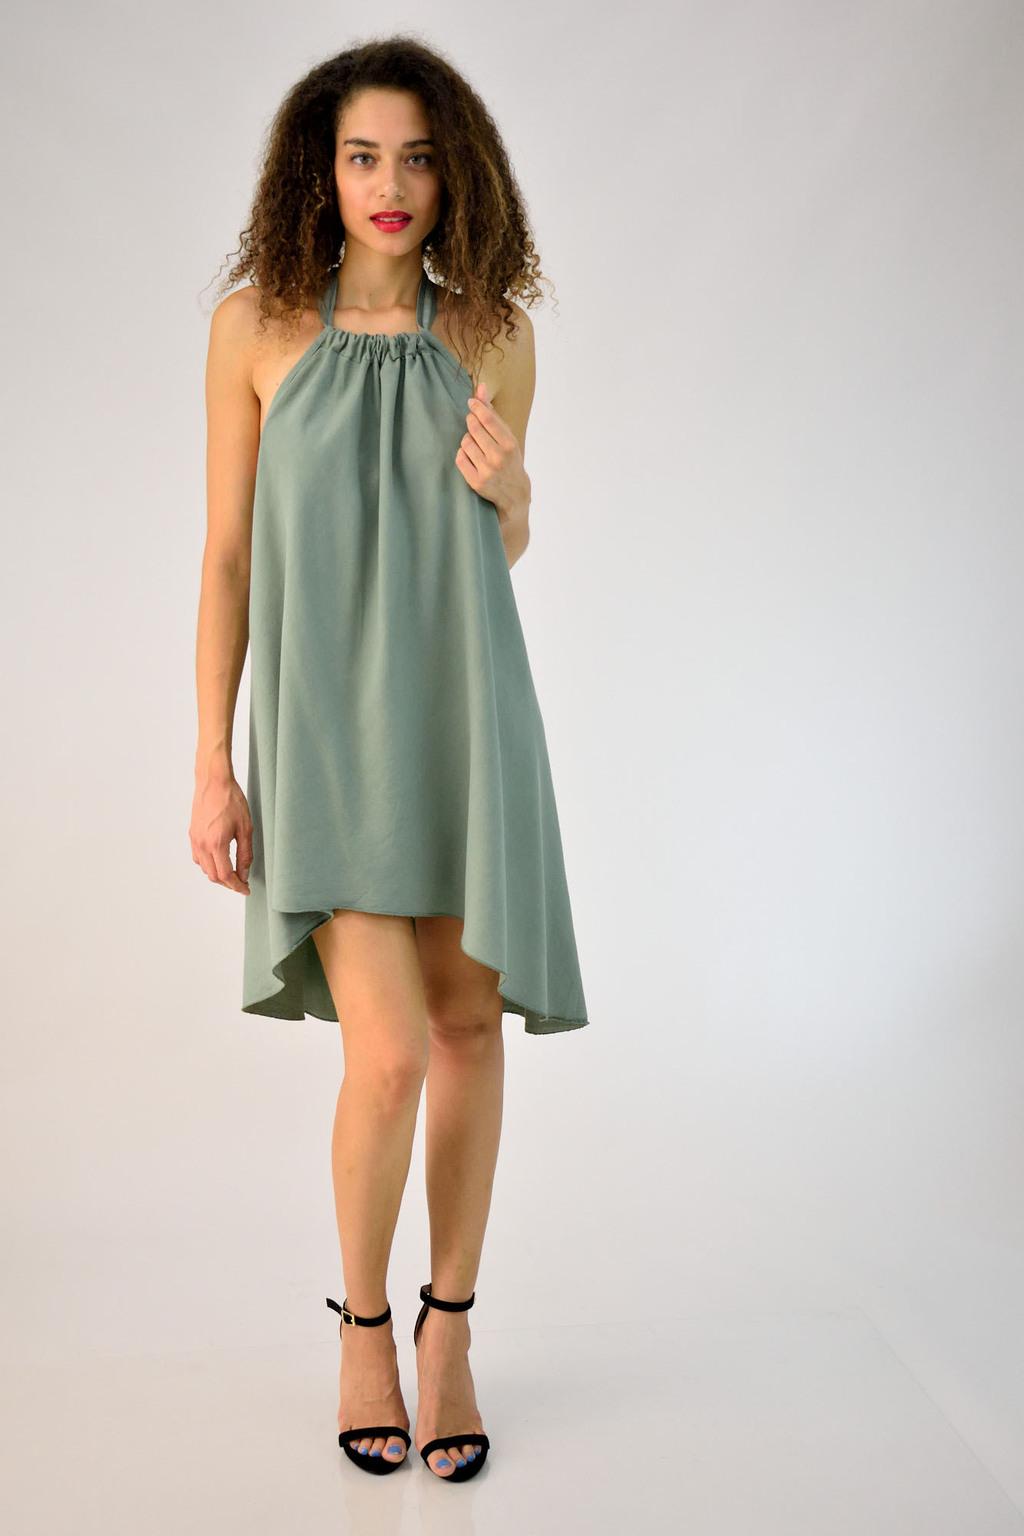 8c8491e65dc1 Μίνι φόρεμα με δέσιμο στον λαιμό